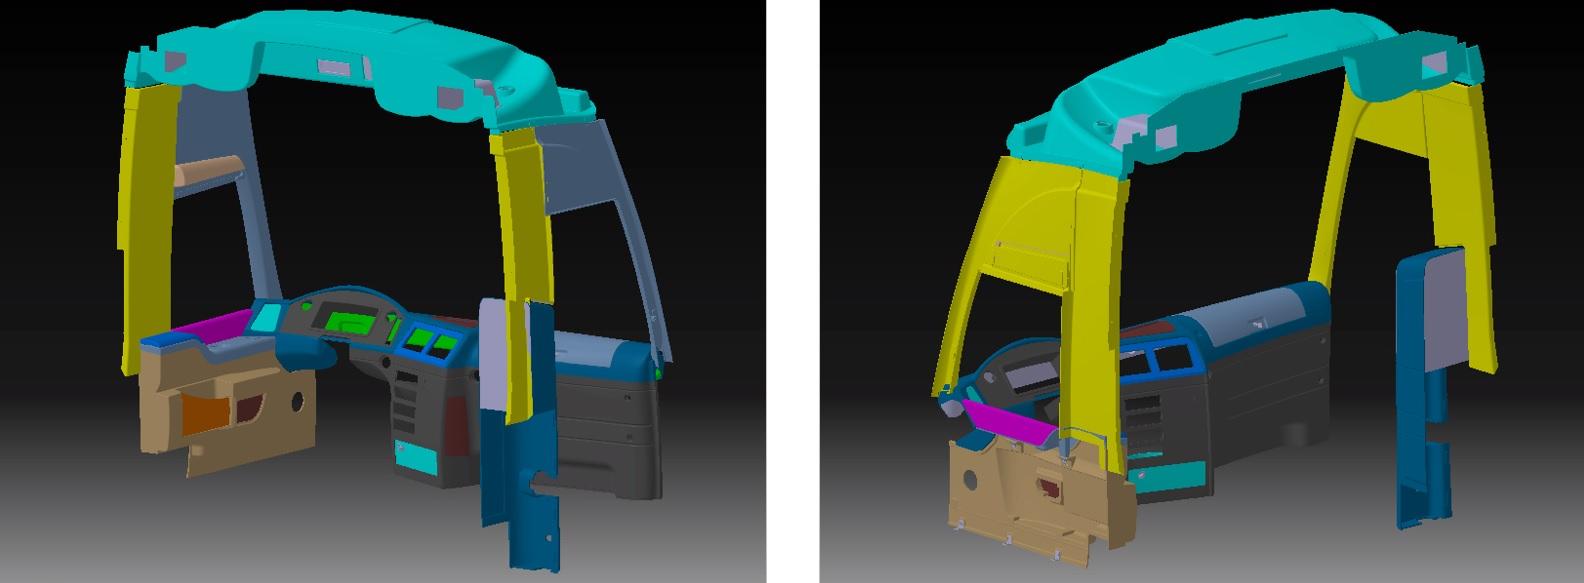 Bus interior design Araç tasarım